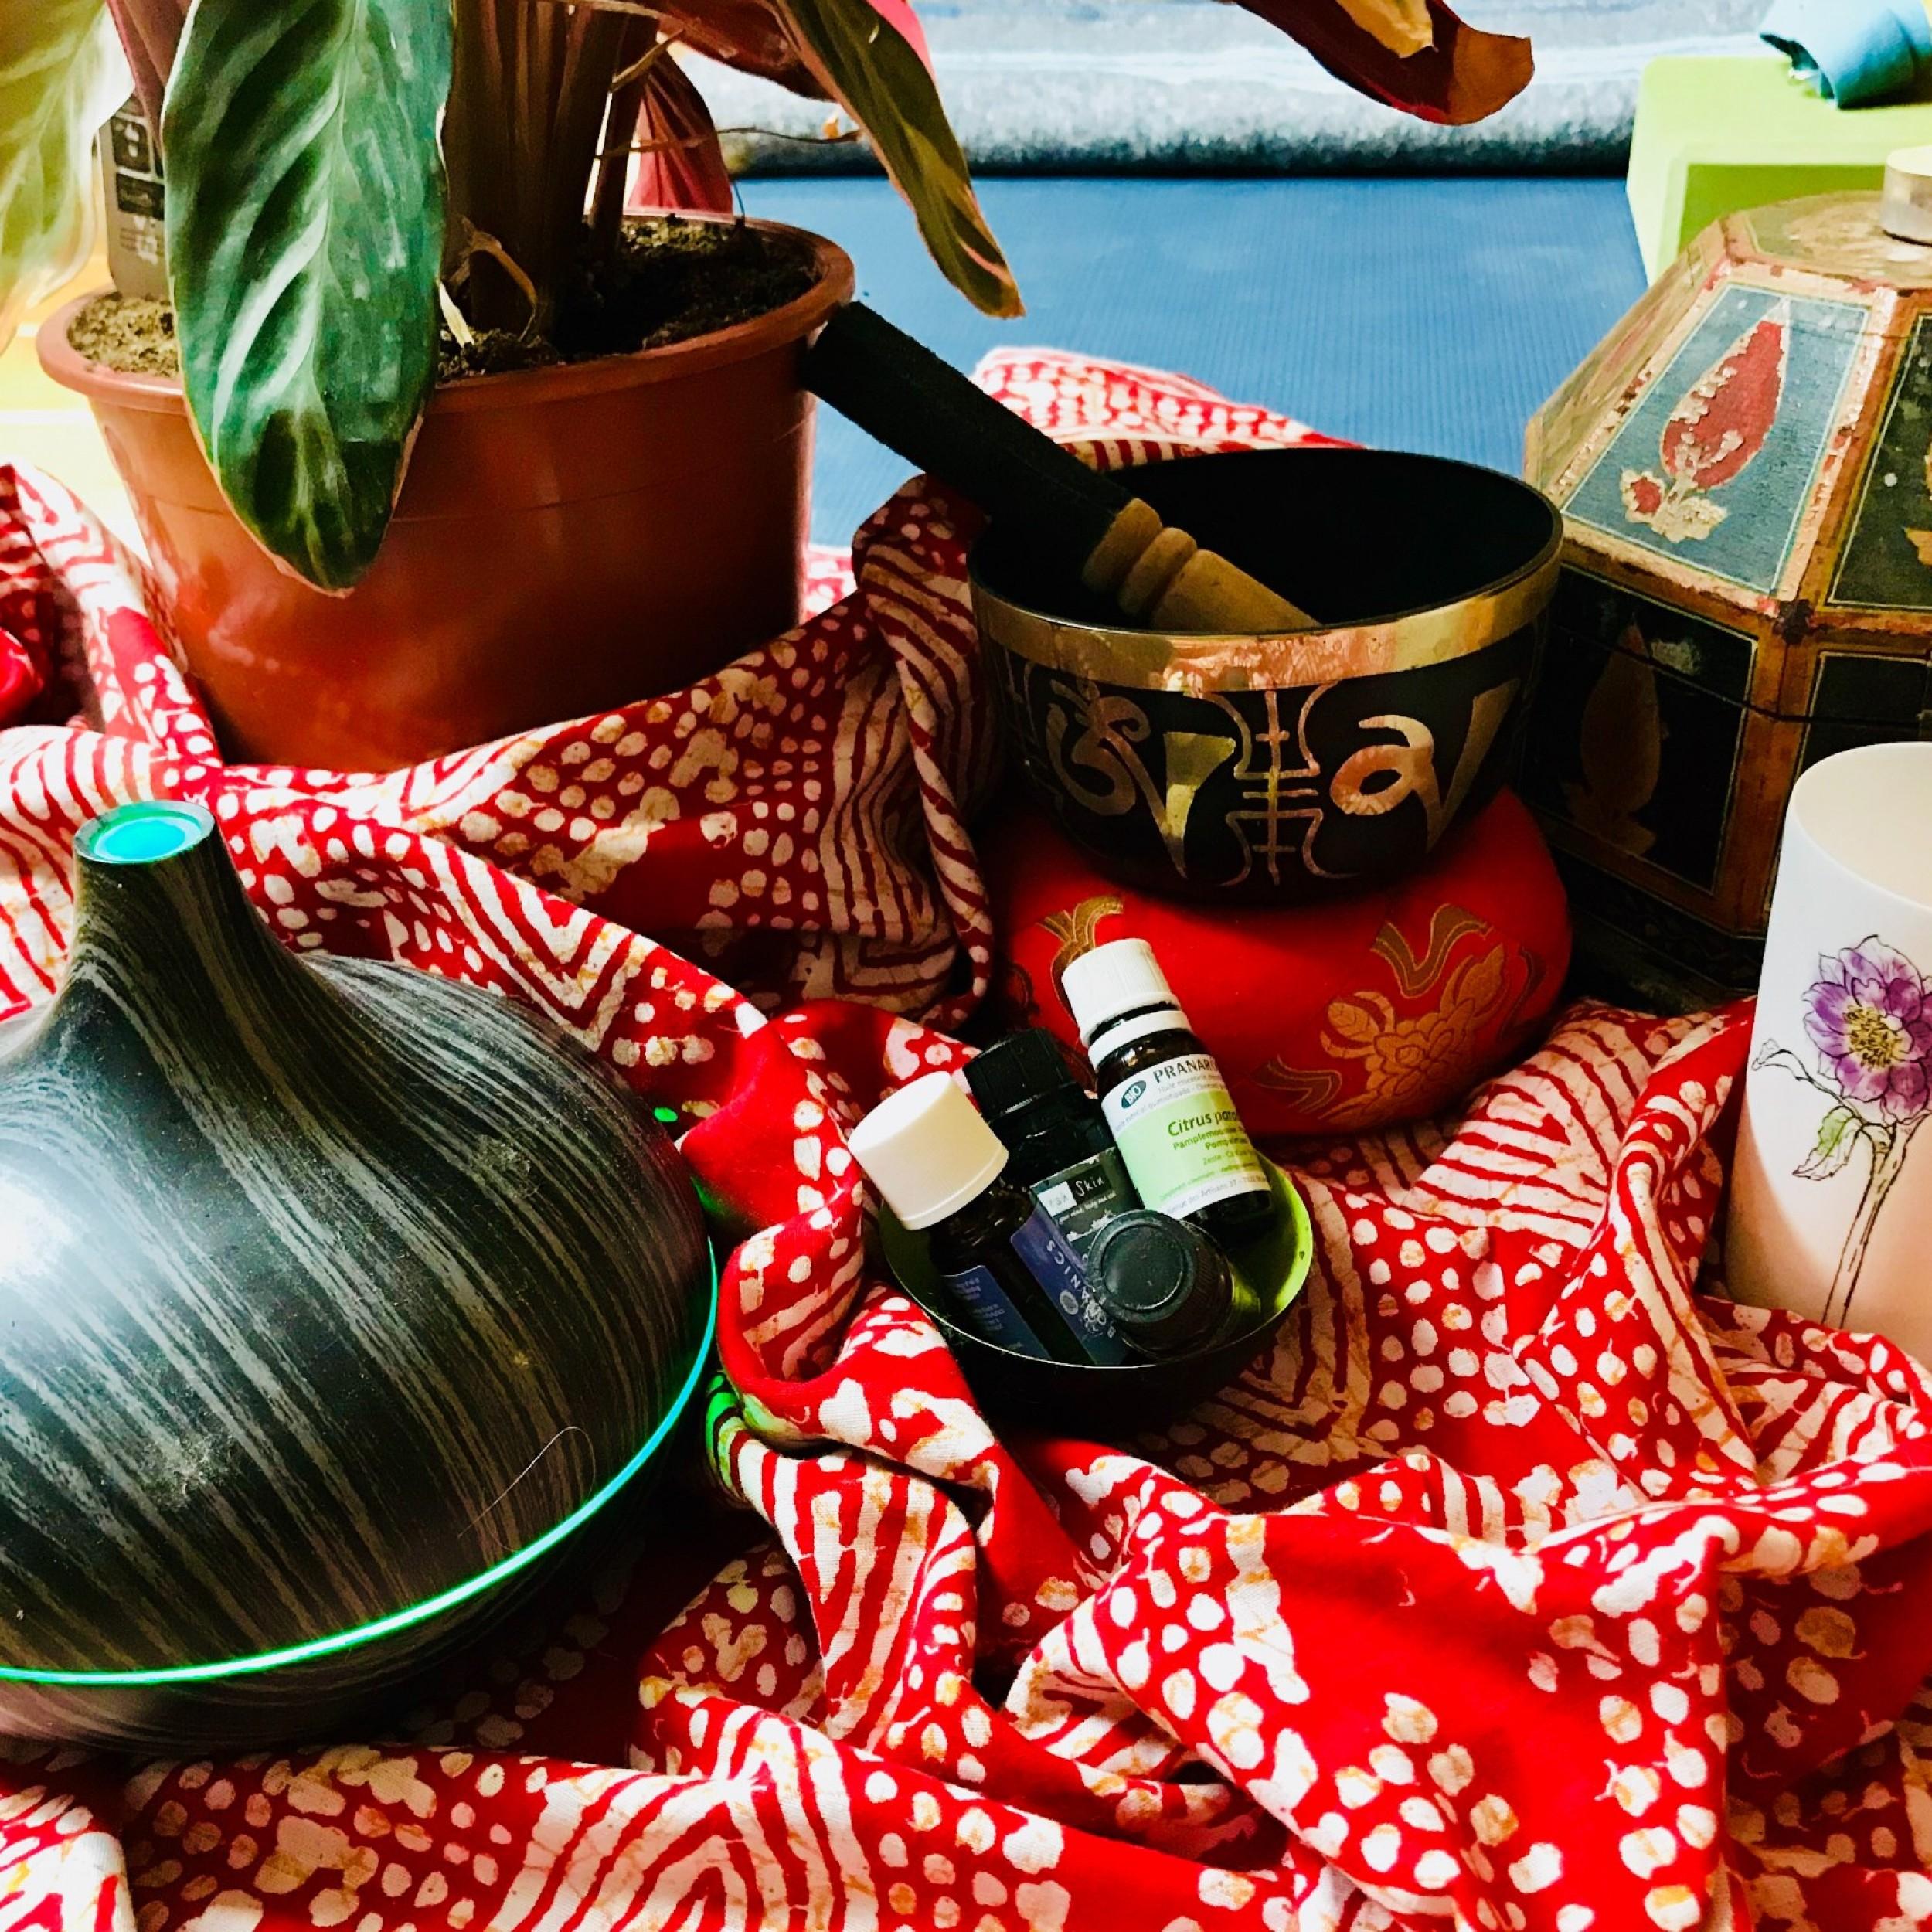 Happy Balance Christmas (meditation, pranayama, yin, Somatics, hormones, water element and Spiral)